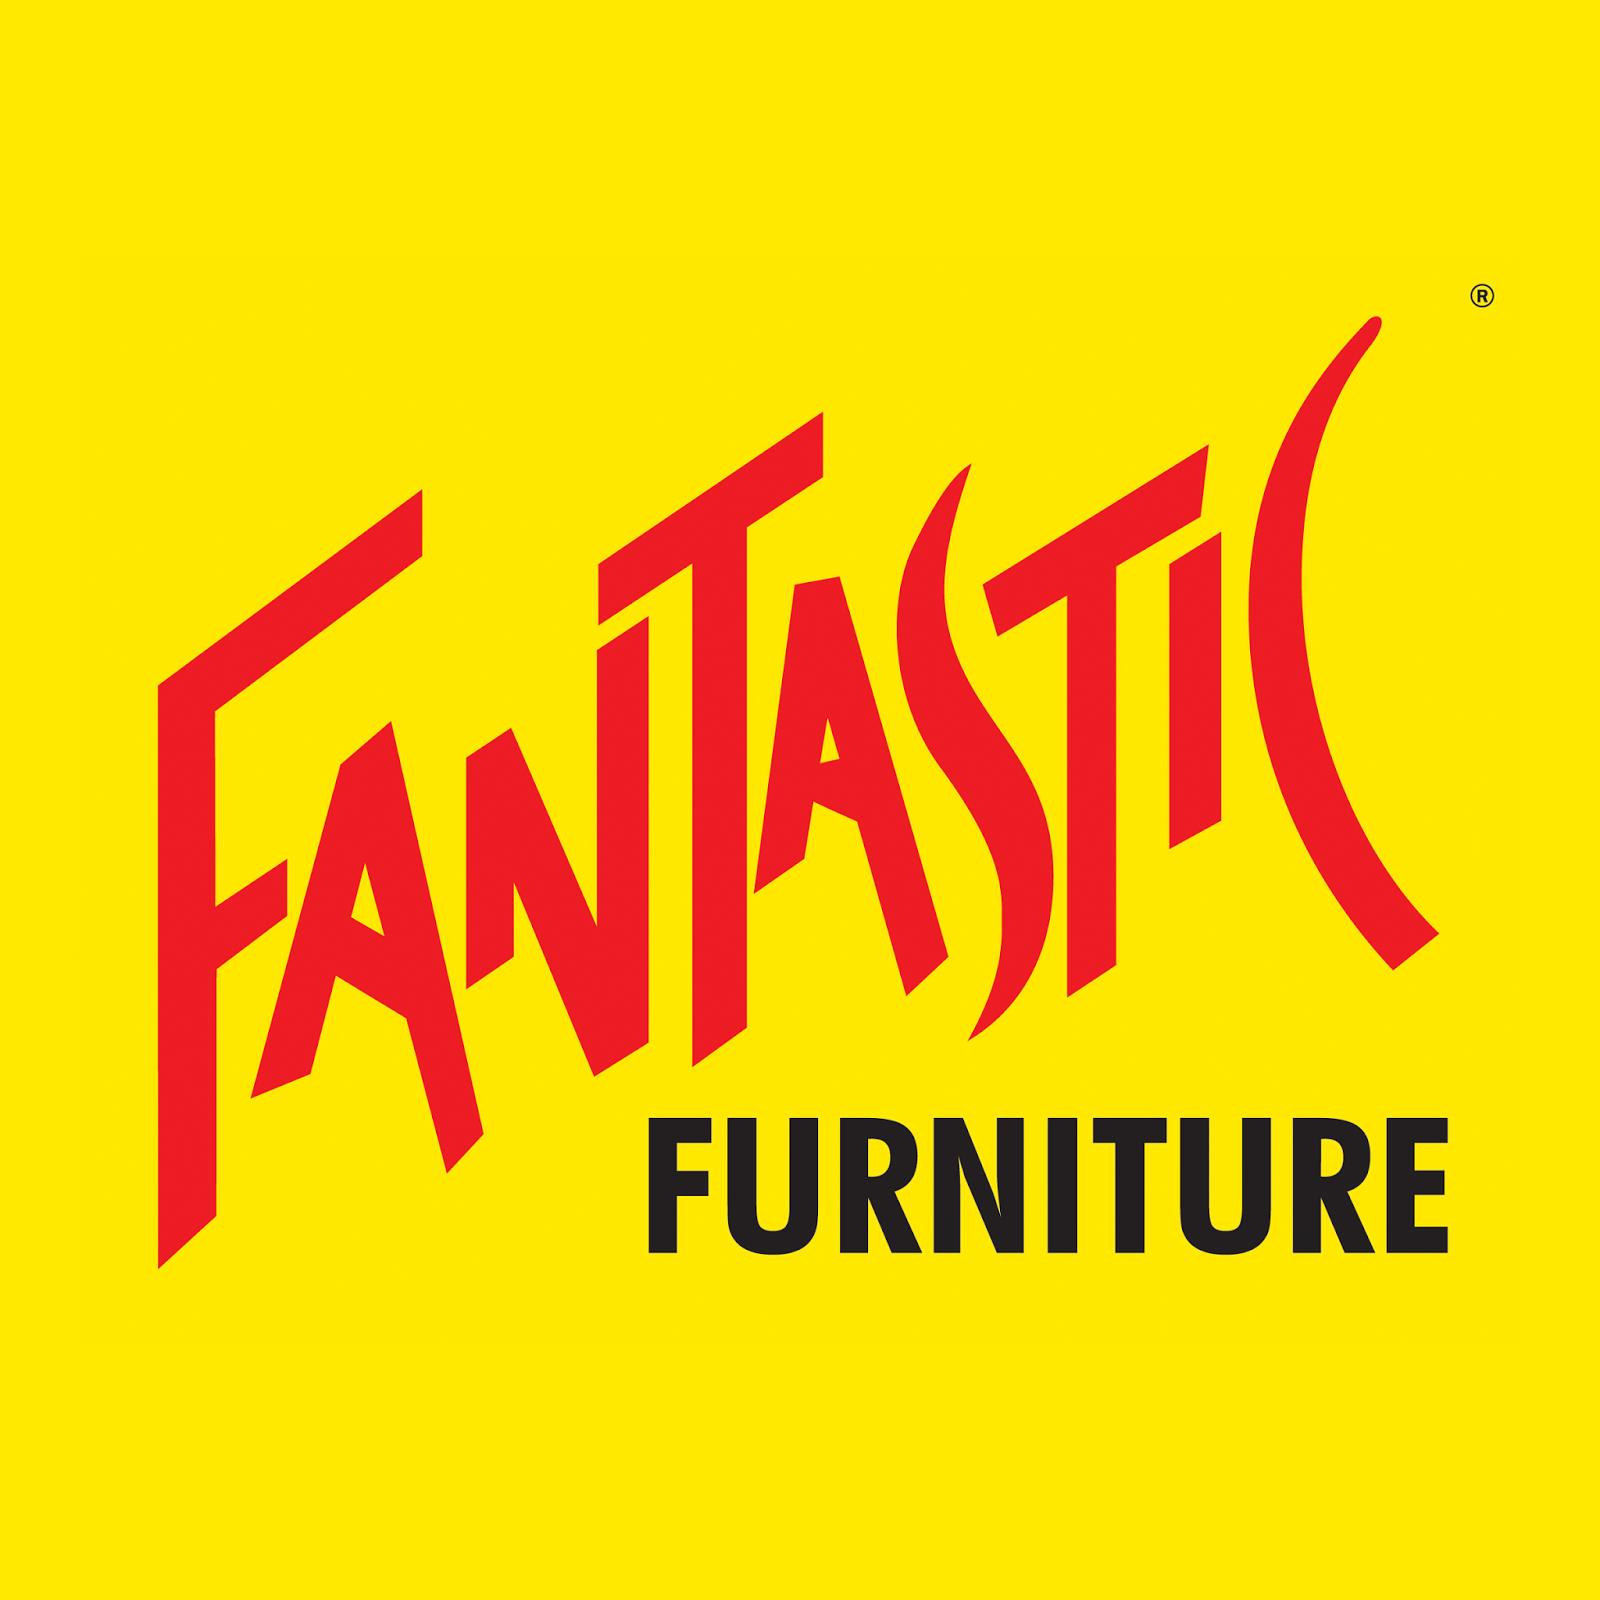 FANTASTIC FURNITURE   LAUNCESTON. FANTASTIC FURNITURE 75 LAUNCESTON AUS   Merchant details